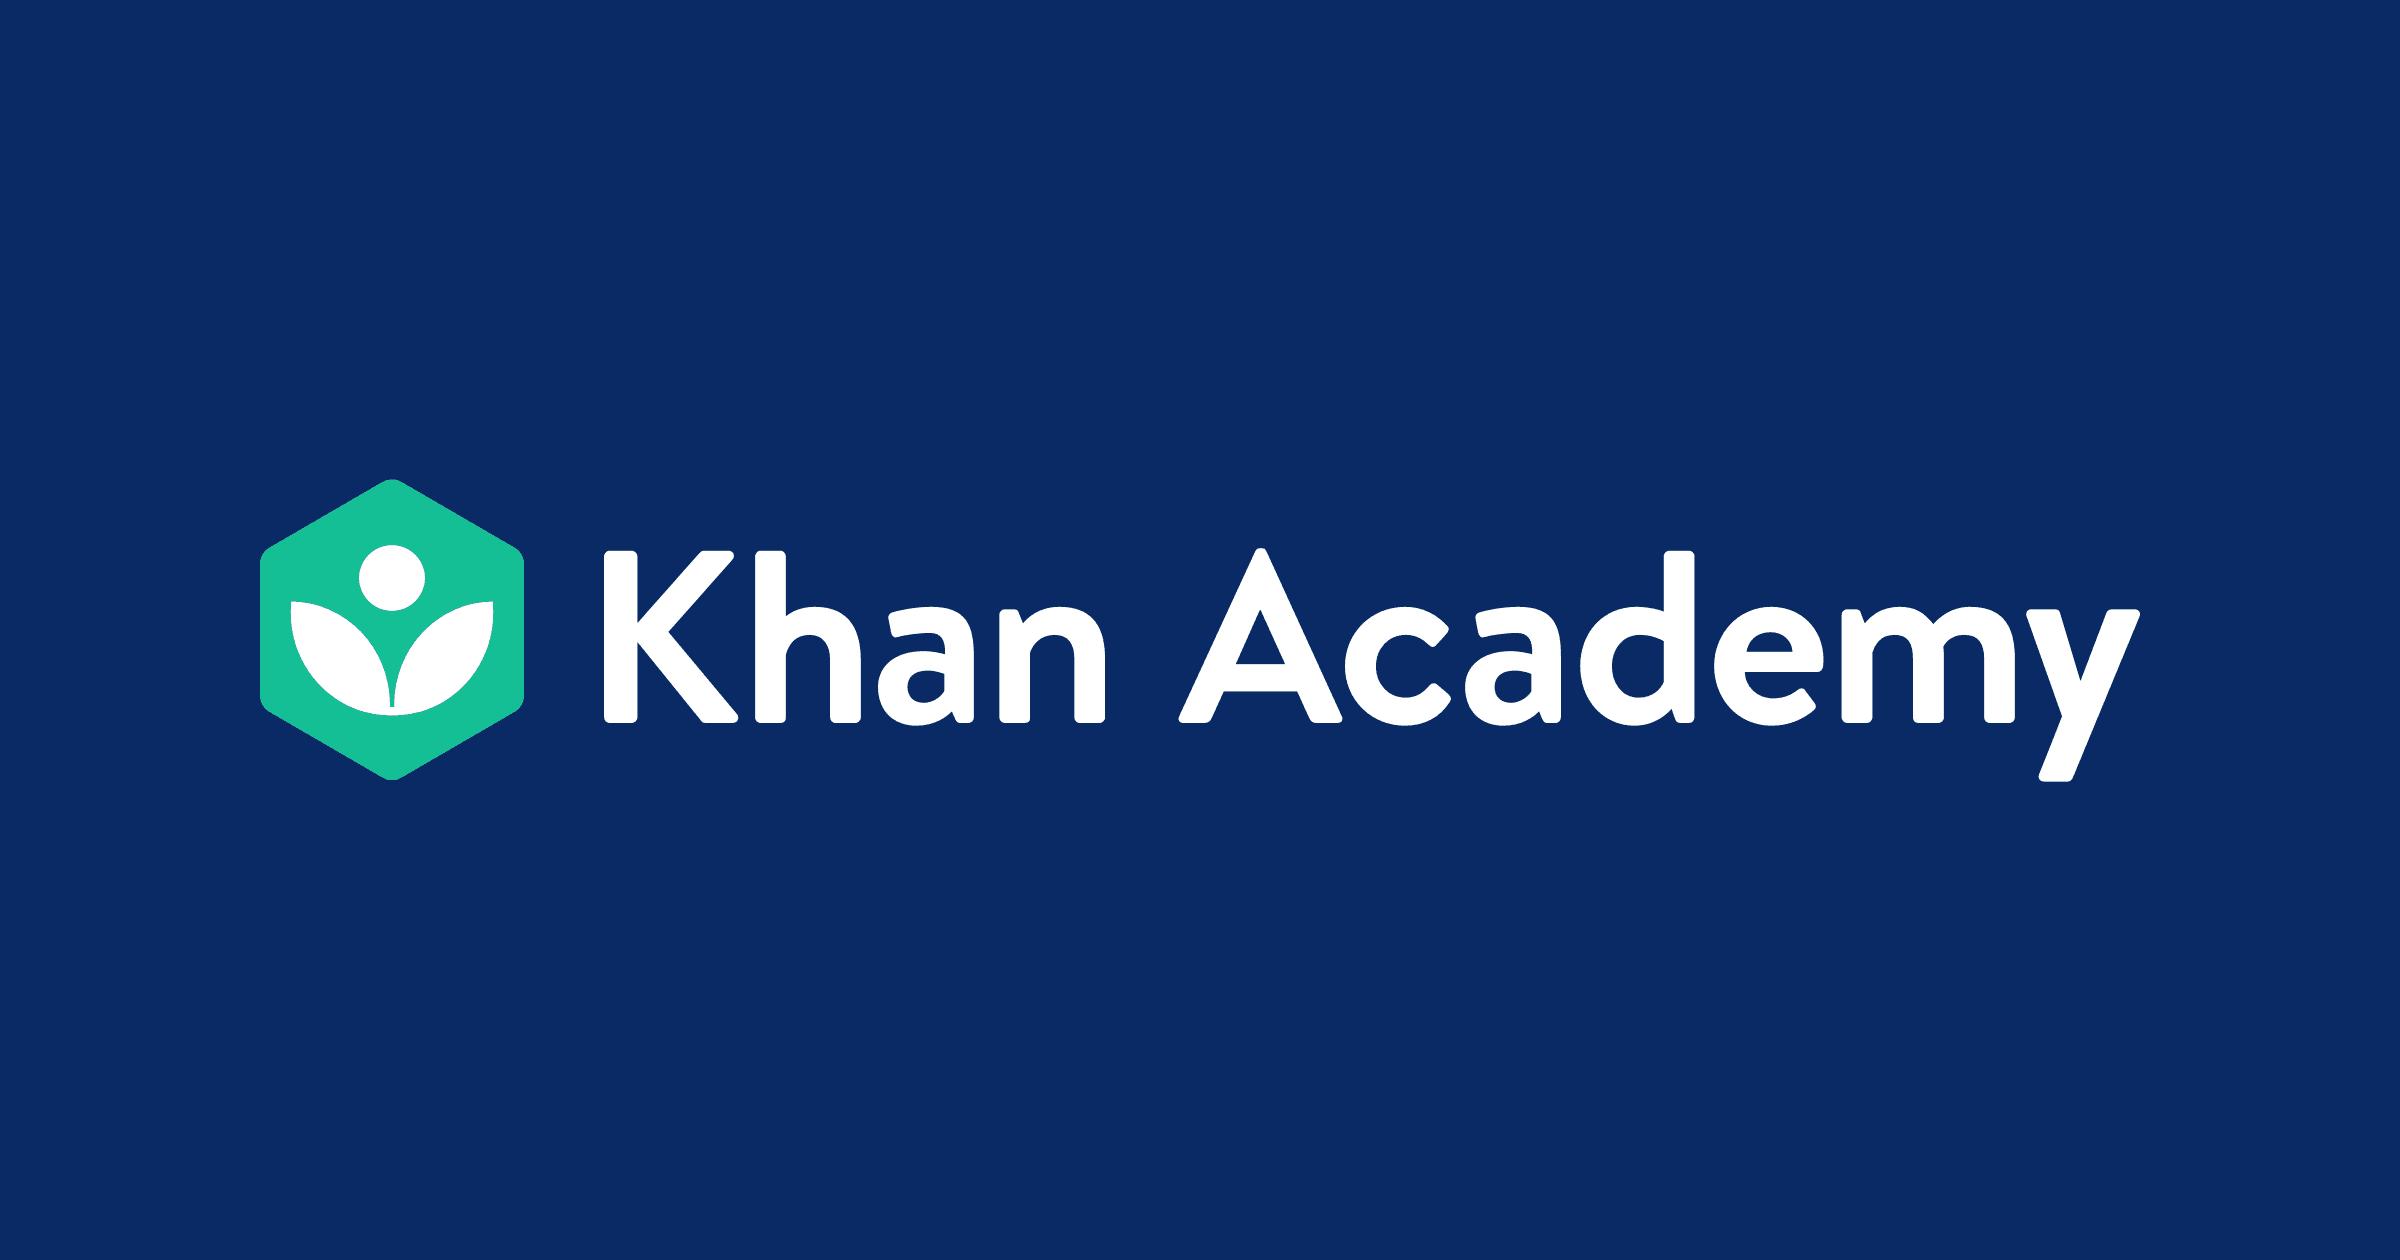 khan logo dark background.new